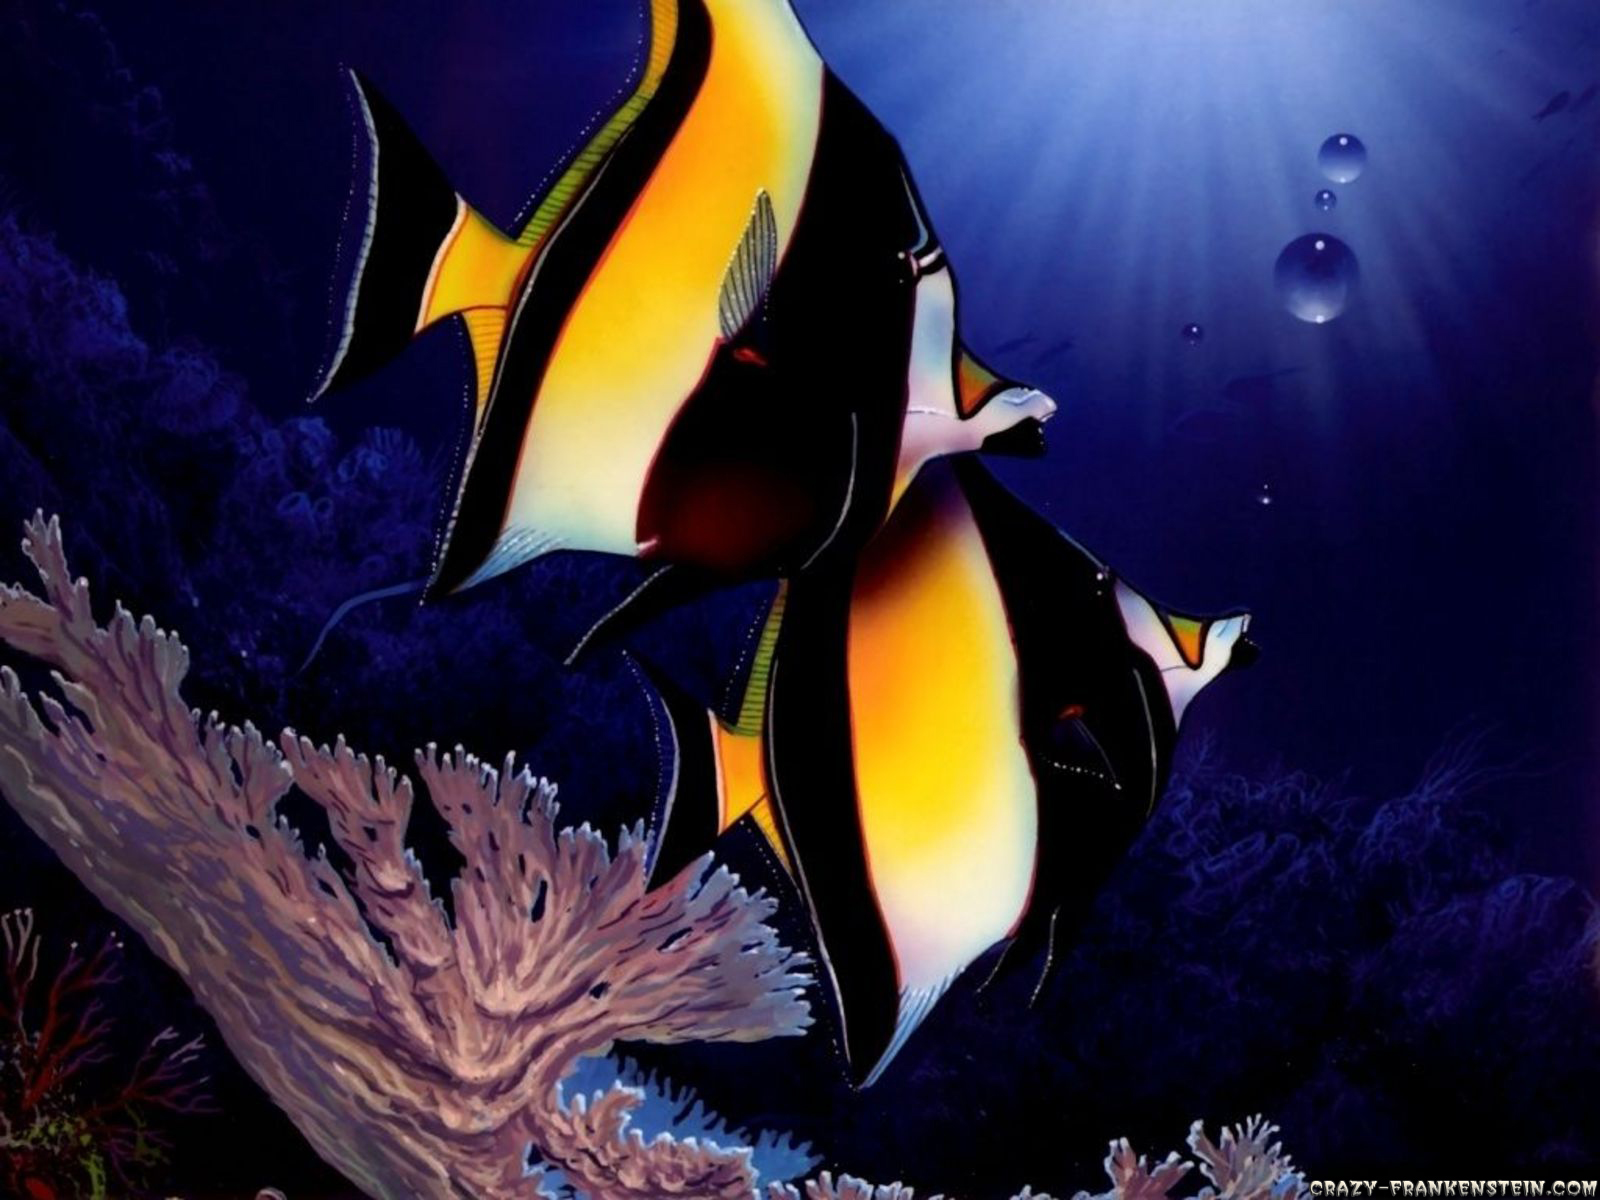 http://3.bp.blogspot.com/-W-64PoKcWK4/TlwW1vCN_mI/AAAAAAAABR4/cxDXwBjxrOY/s1600/fish-wallpaper-9.jpg